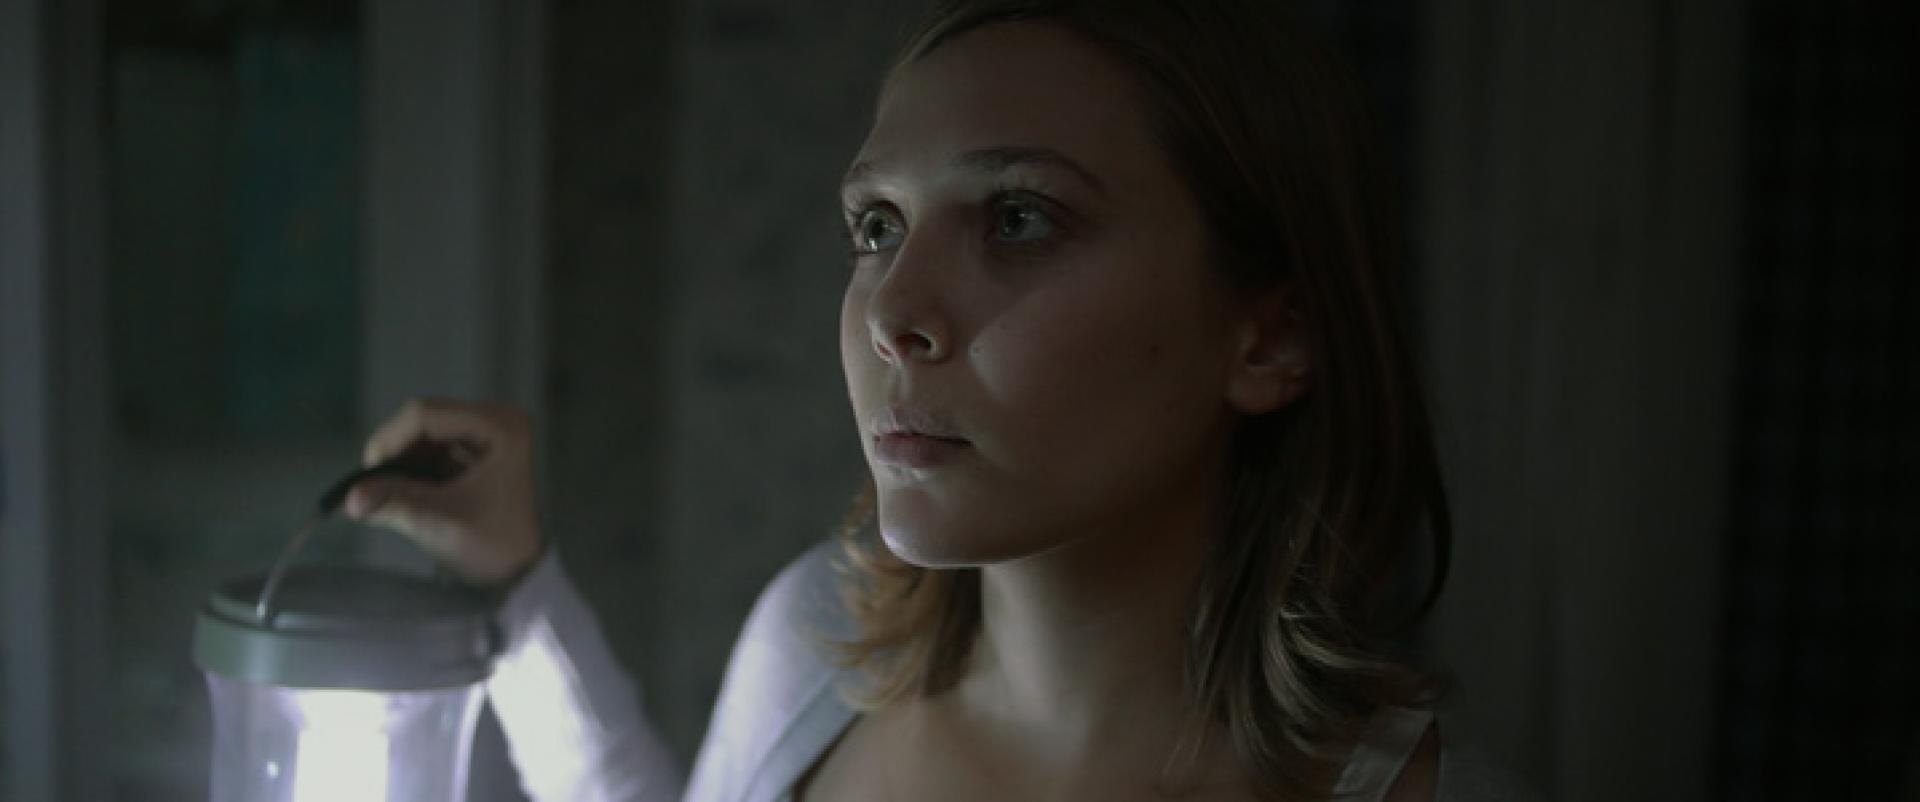 The Silent House (2011)